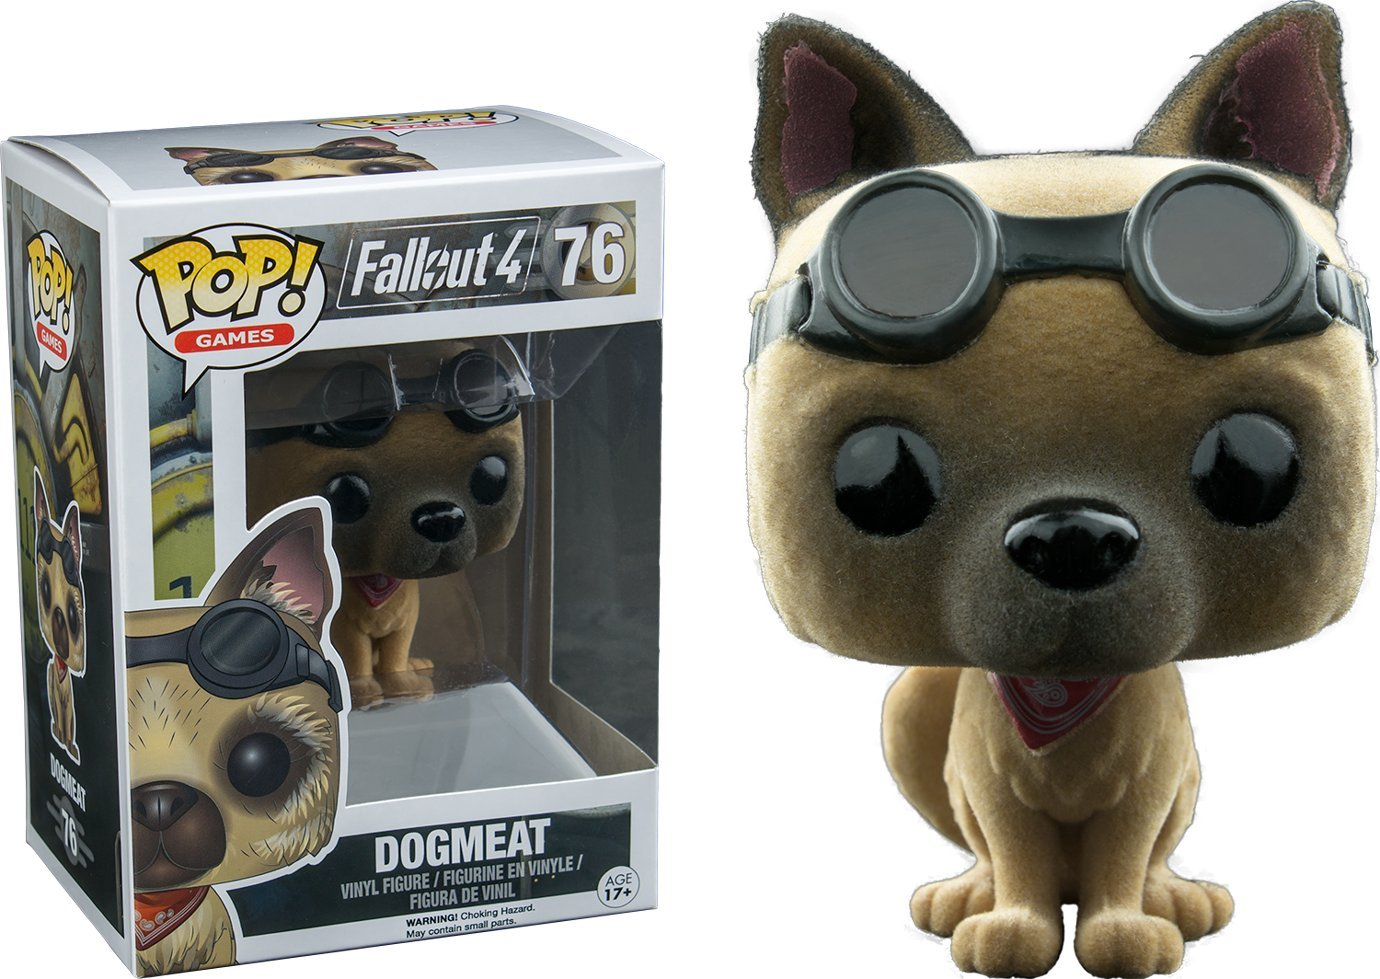 Pop  Games Fallout 4 Vinyl Figure Dogmeat  76 EB Games   Gamestop Exclusive Flocked, Fuzzy